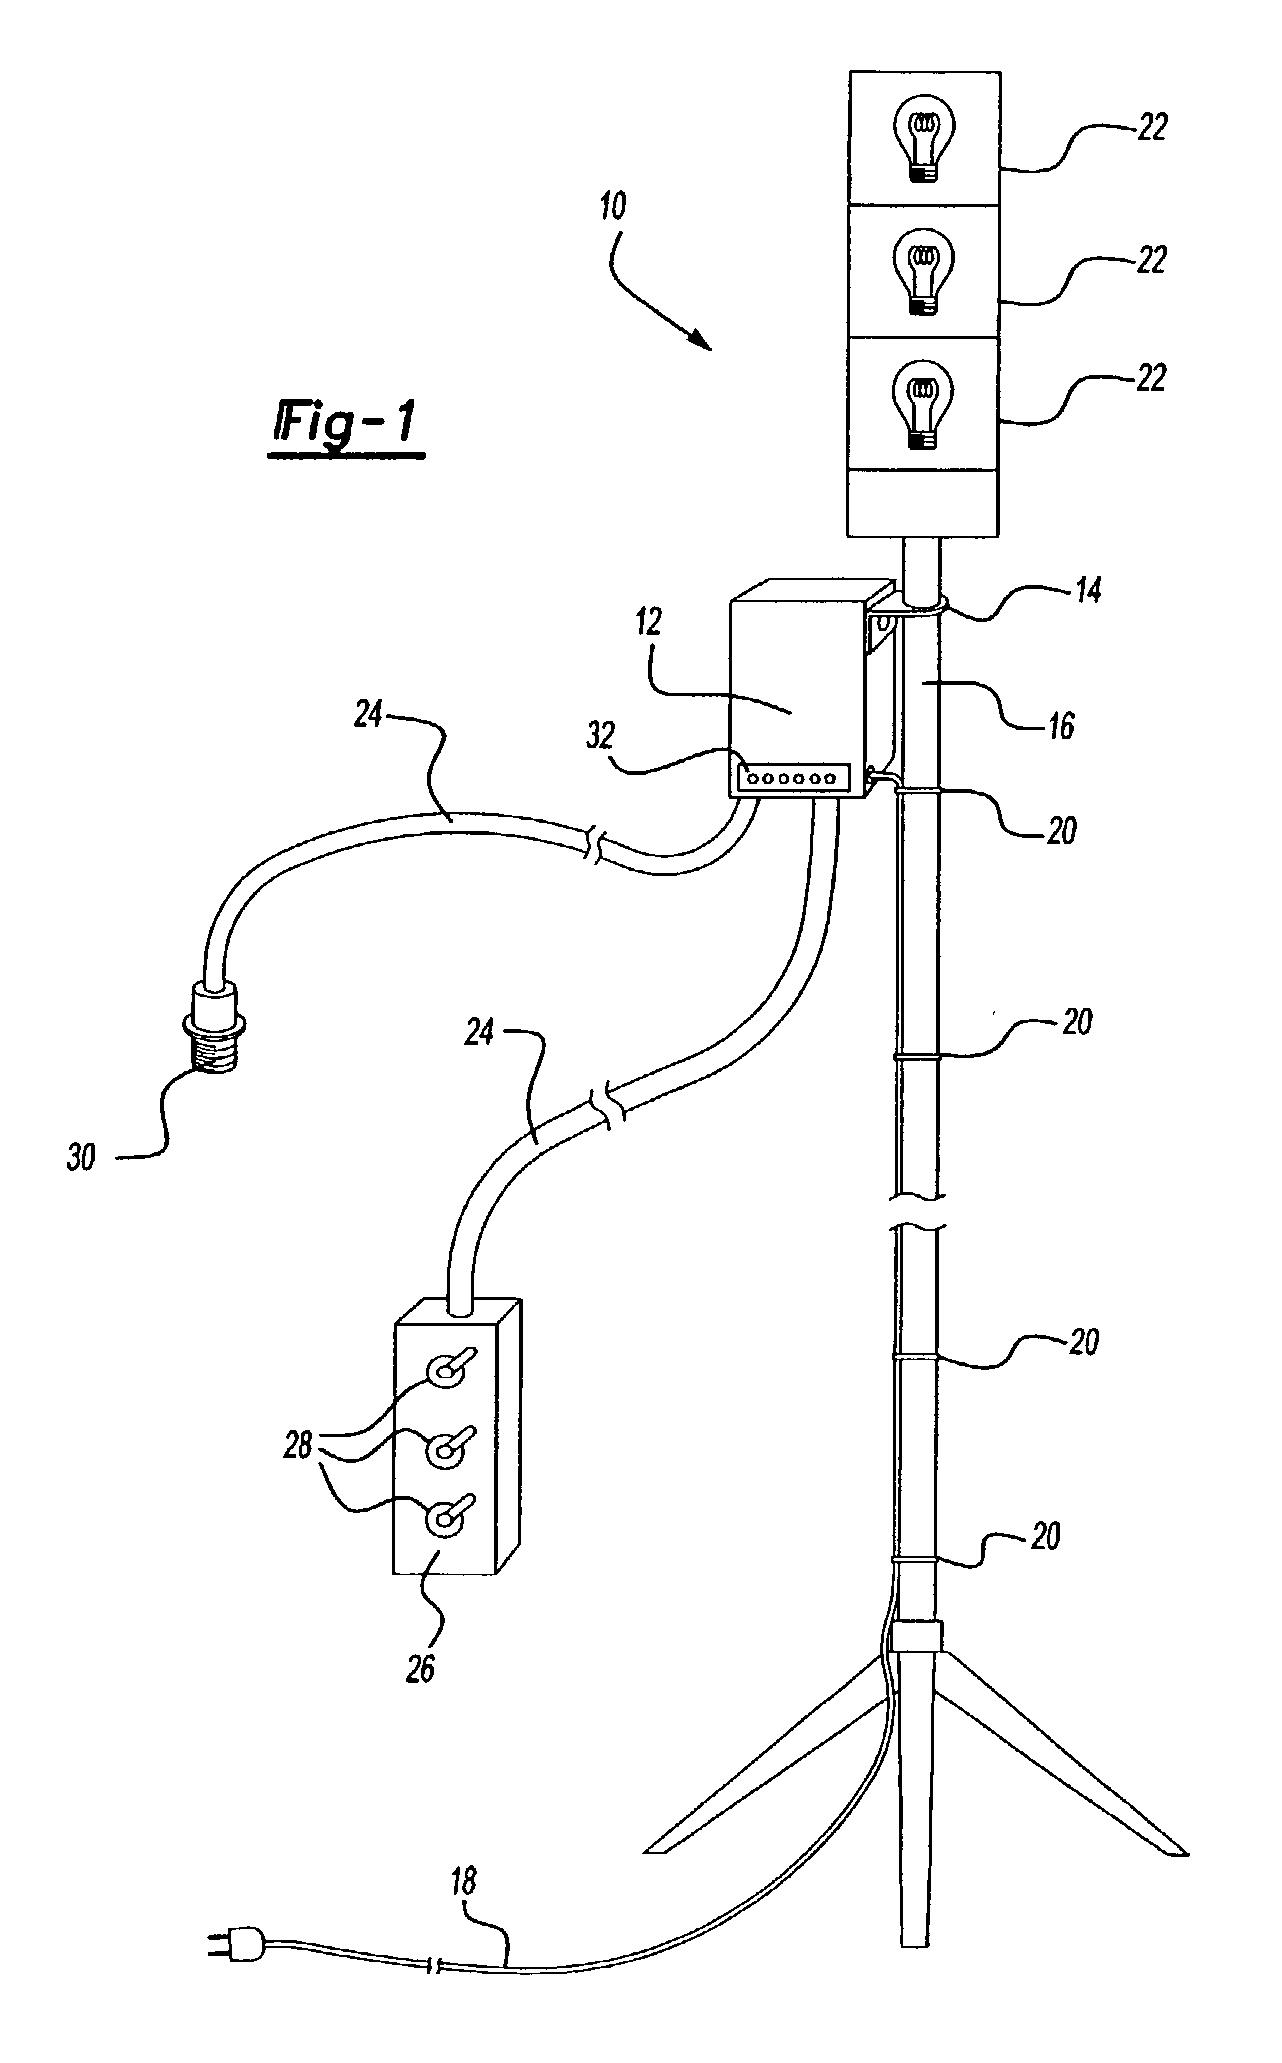 Werma Signaltechnik Wiring Diagram : 34 Wiring Diagram